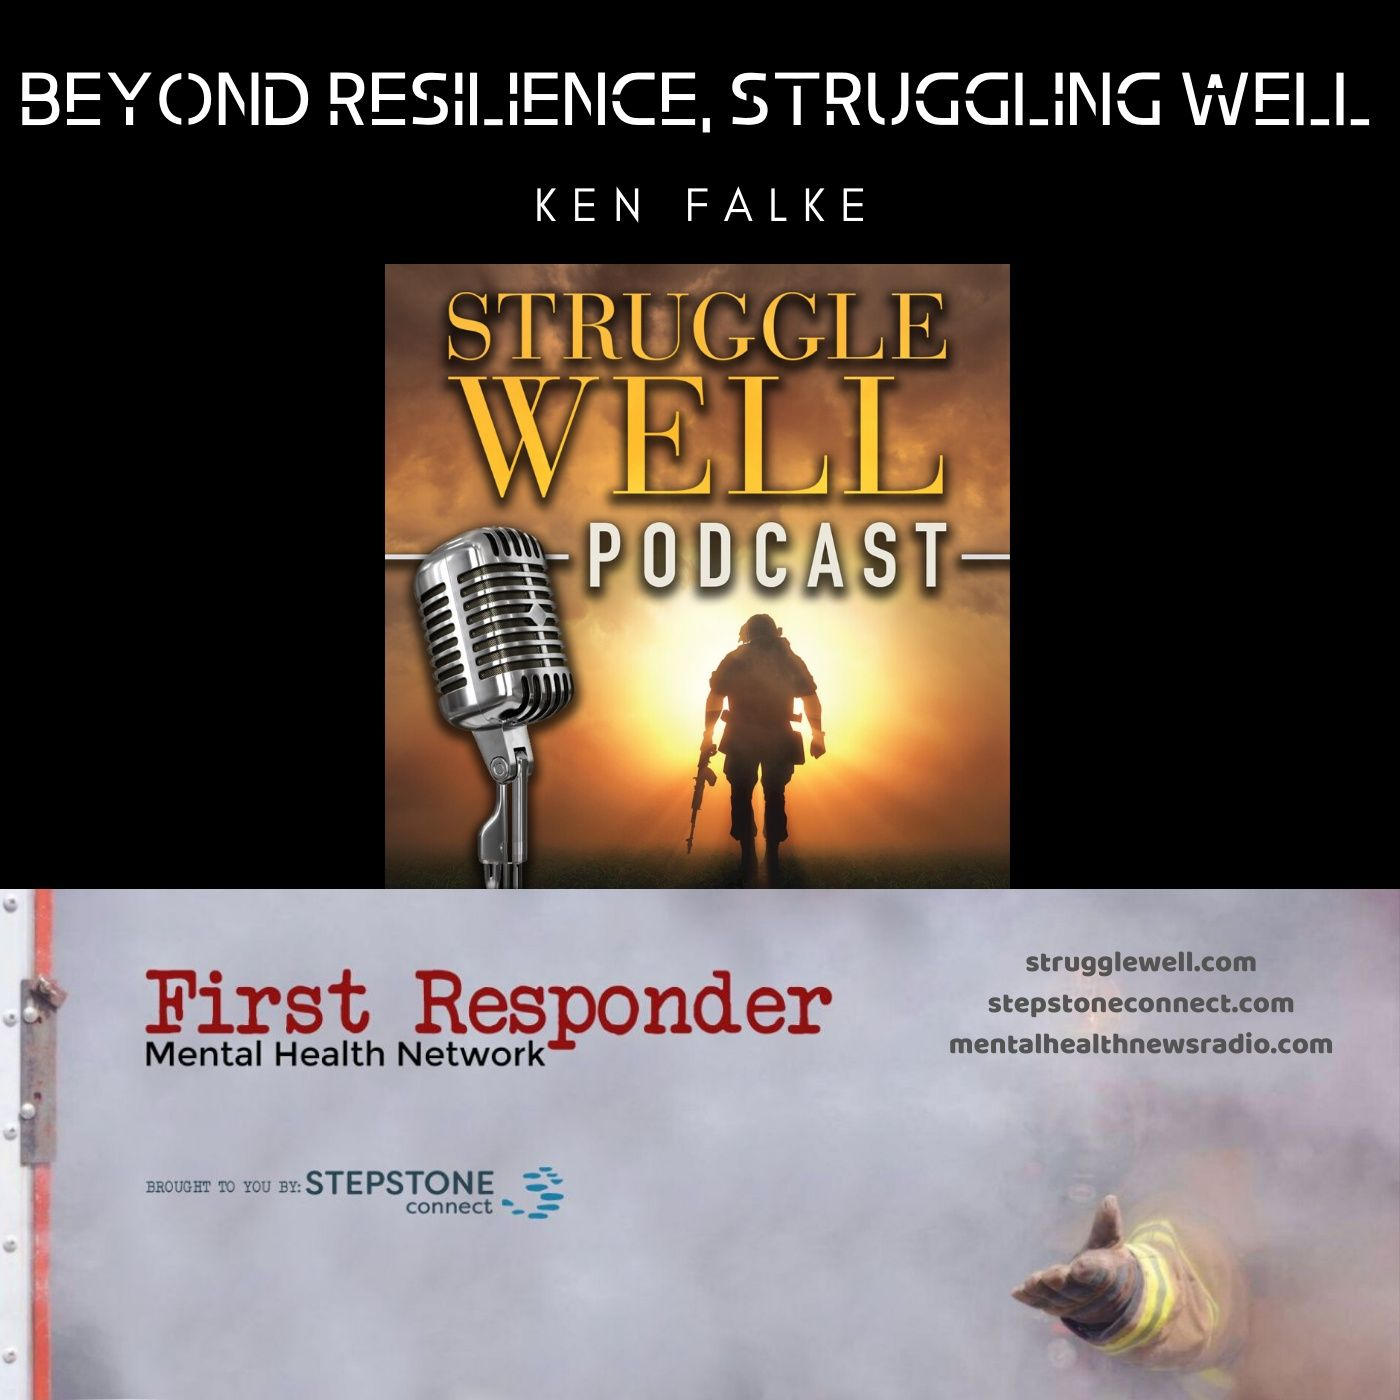 Mental Health News Radio - Beyond Resilience, Struggling Well